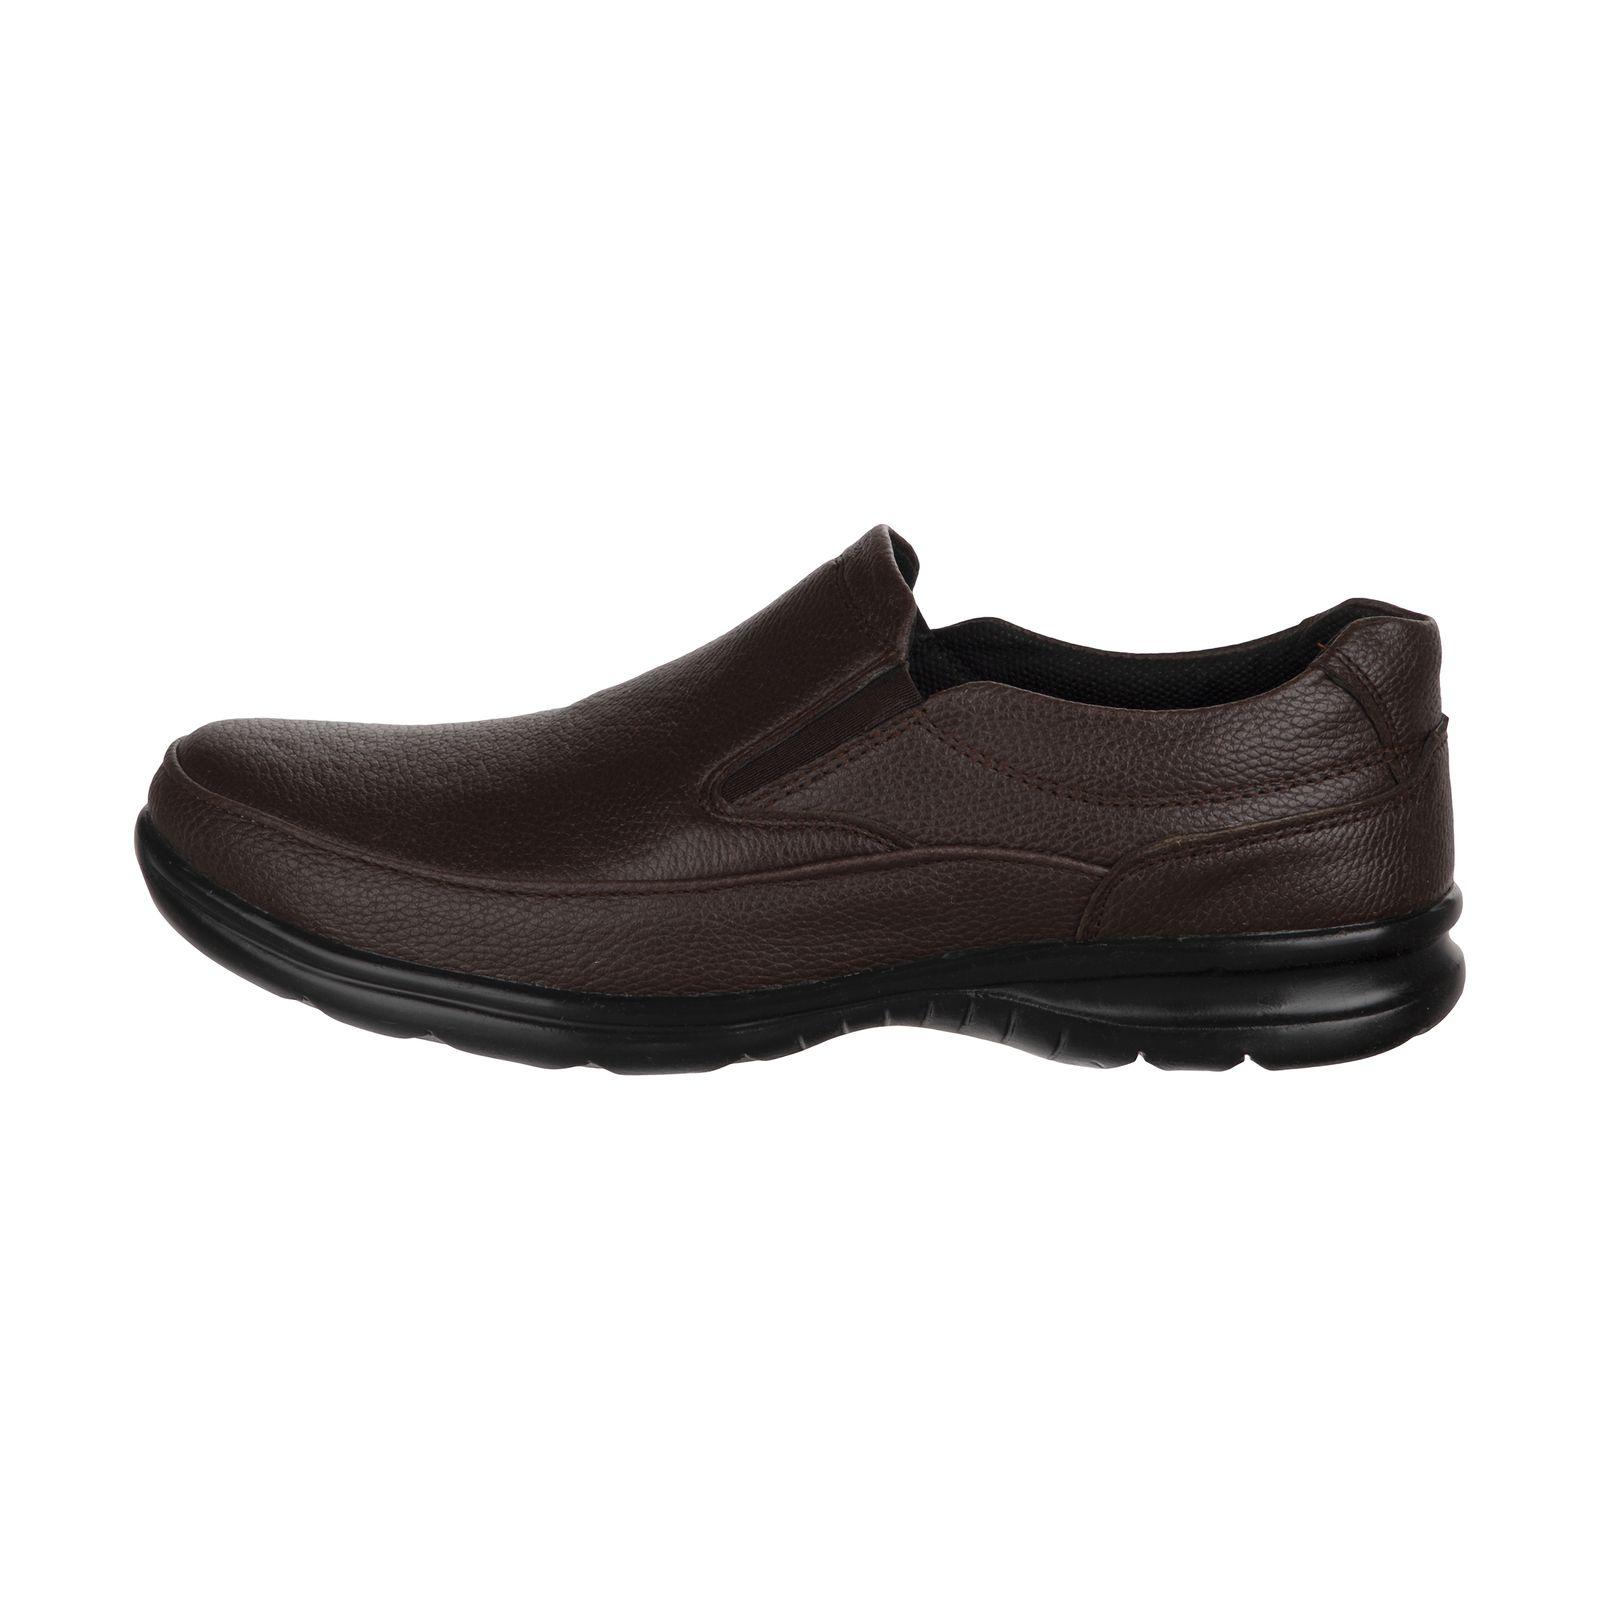 کفش روزمره مردانه مدل k.baz.073 -  - 2